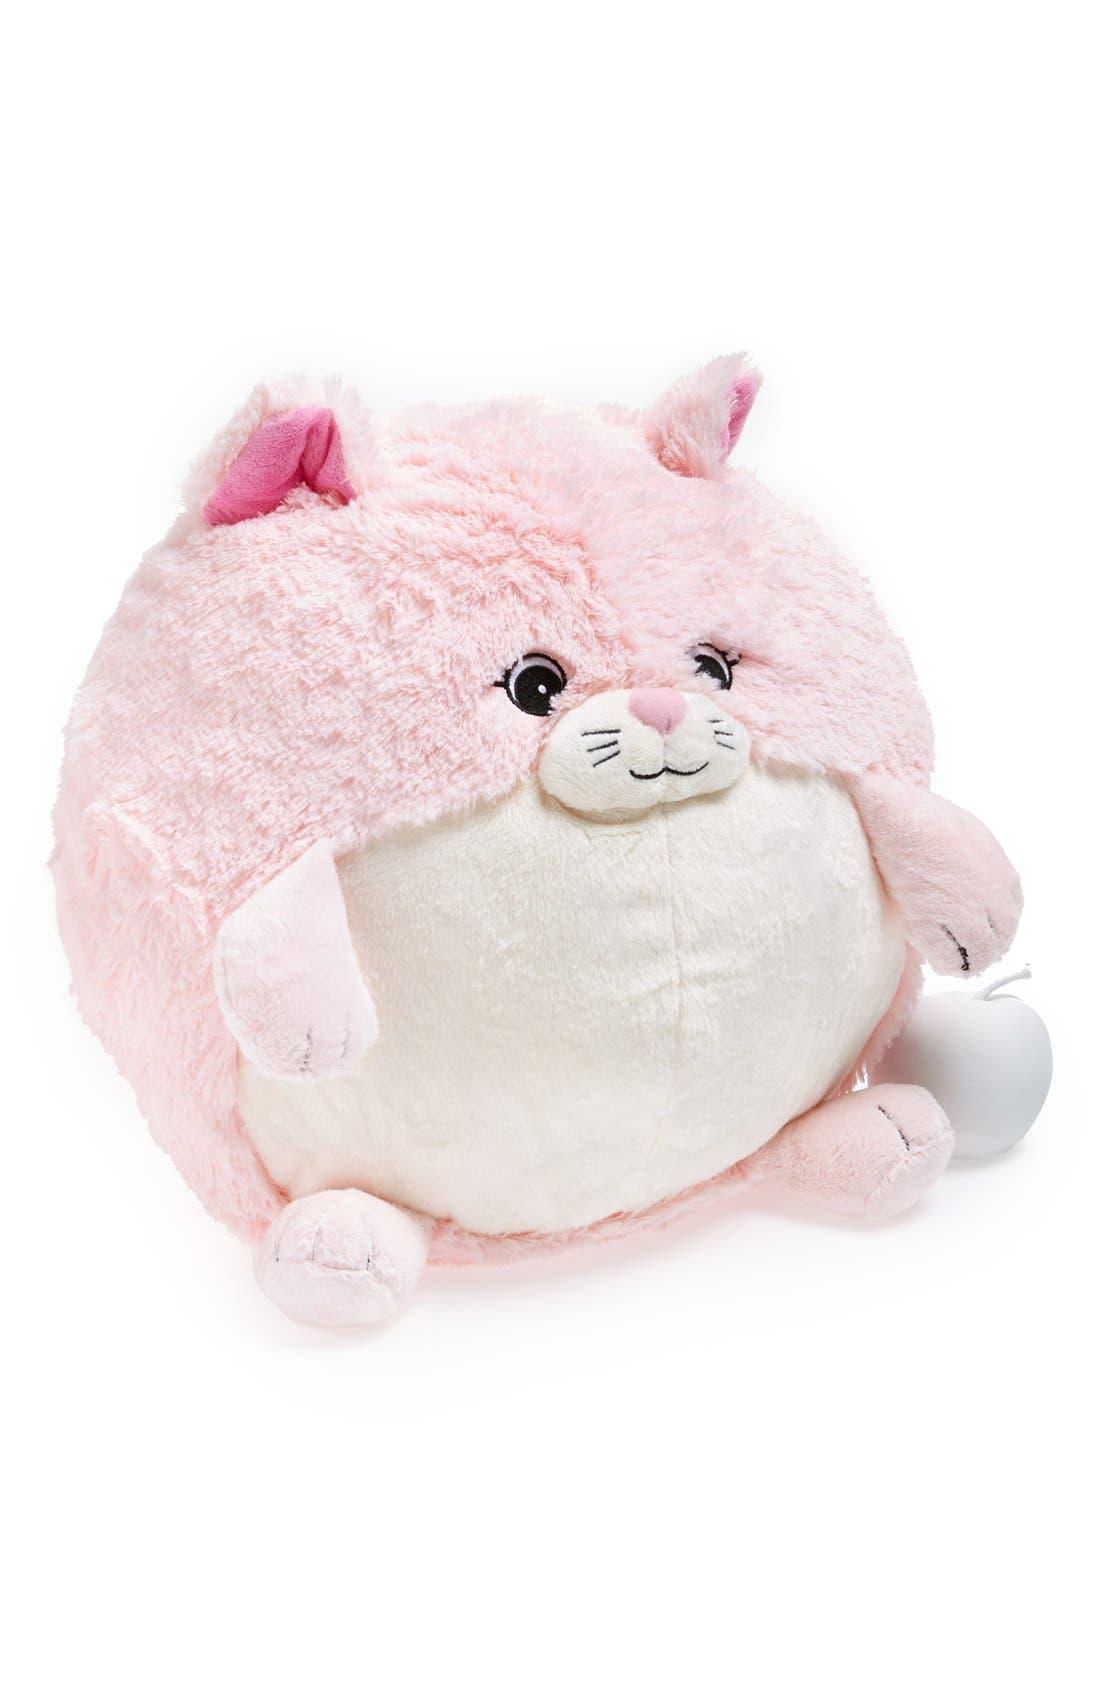 'Pink Kitty' Stuffed Animal,                             Main thumbnail 1, color,                             650